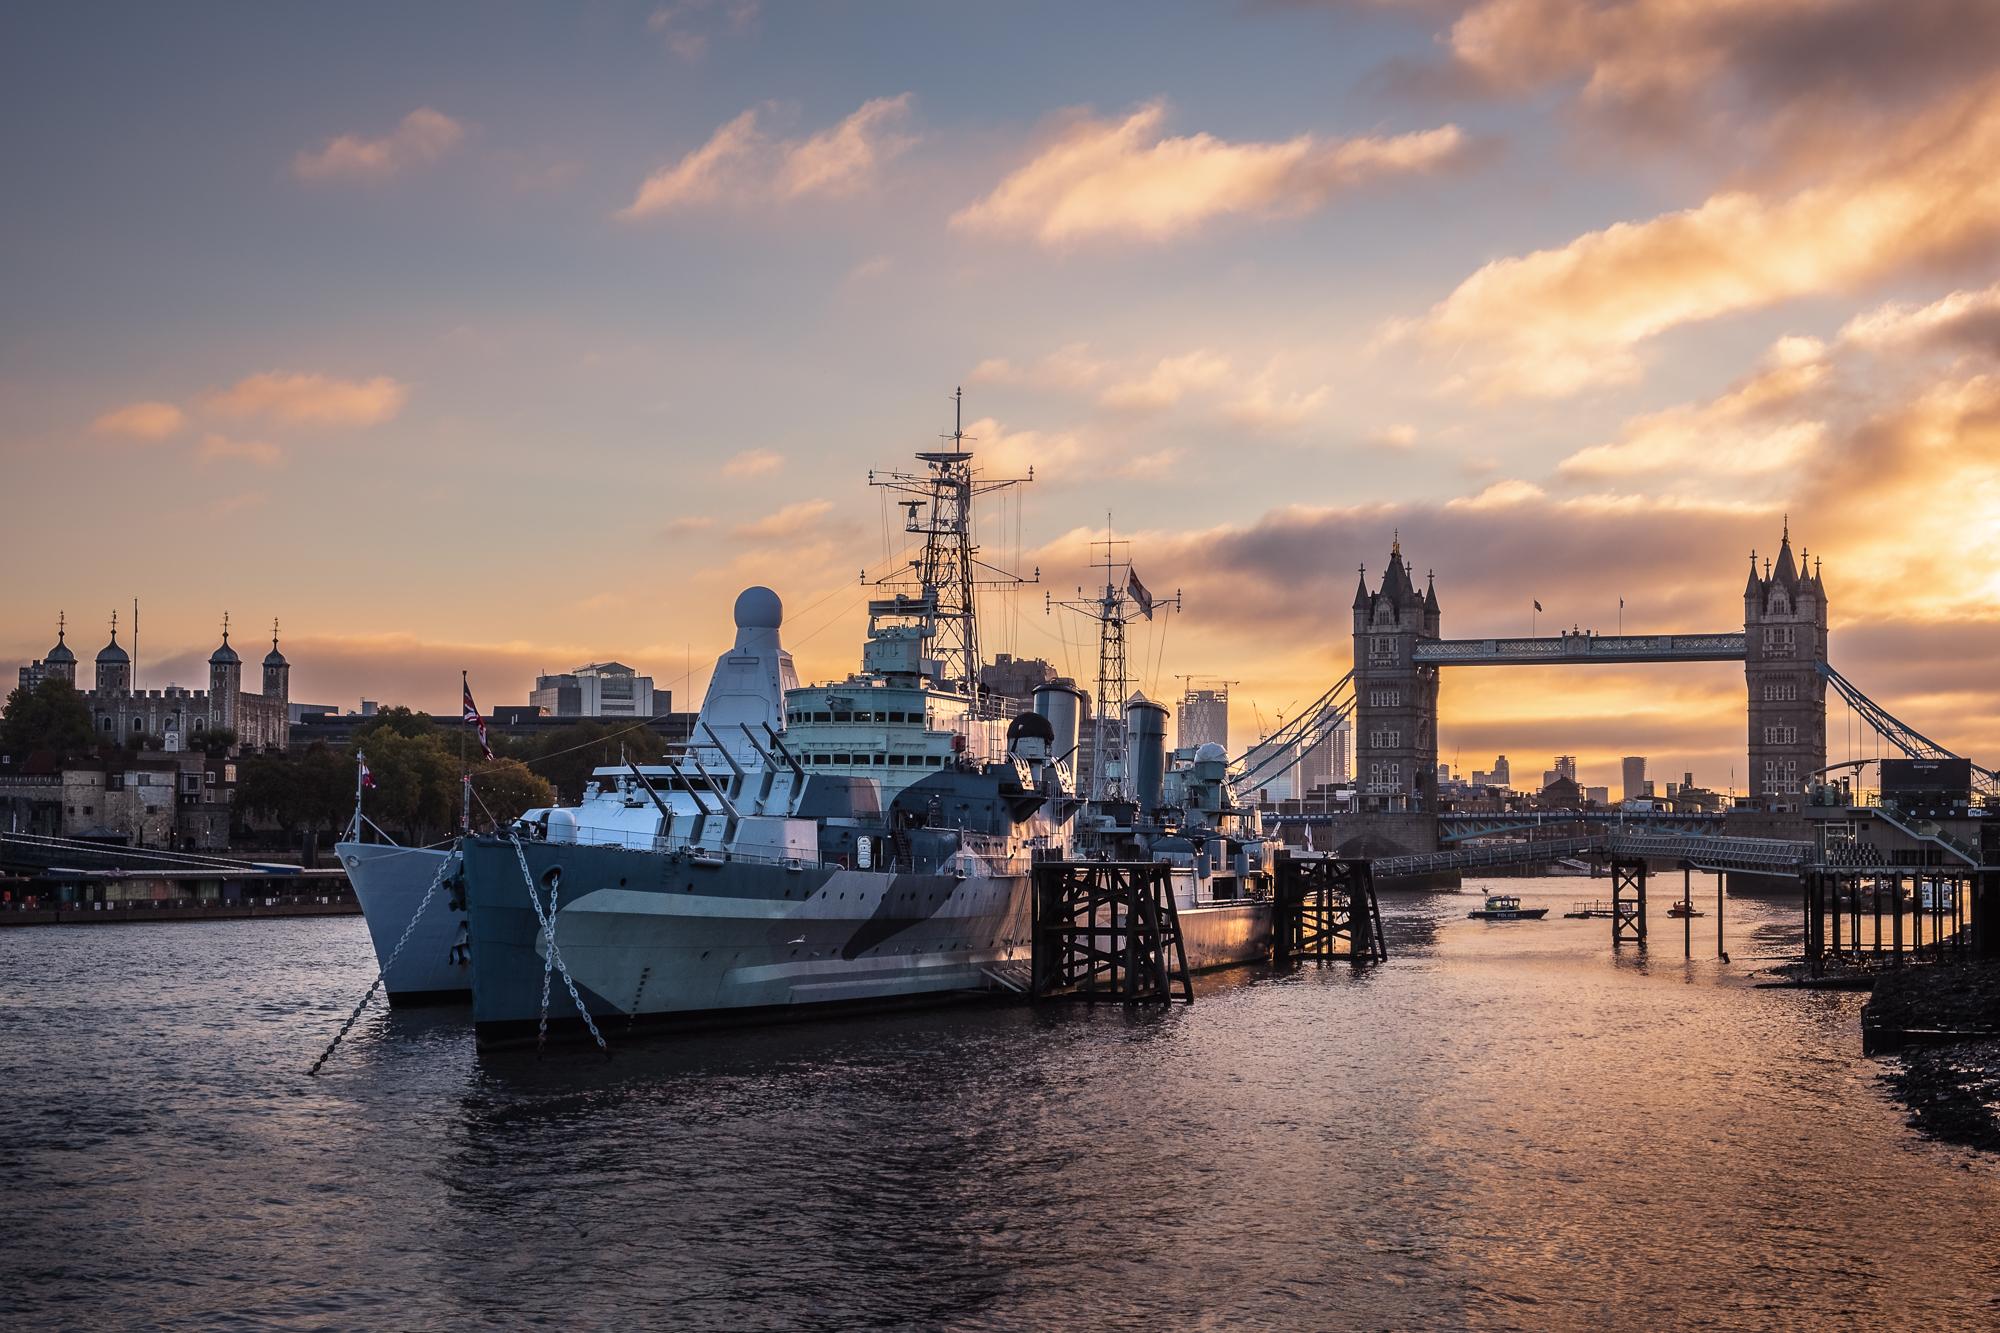 HMS Belfast at Sunrise, London